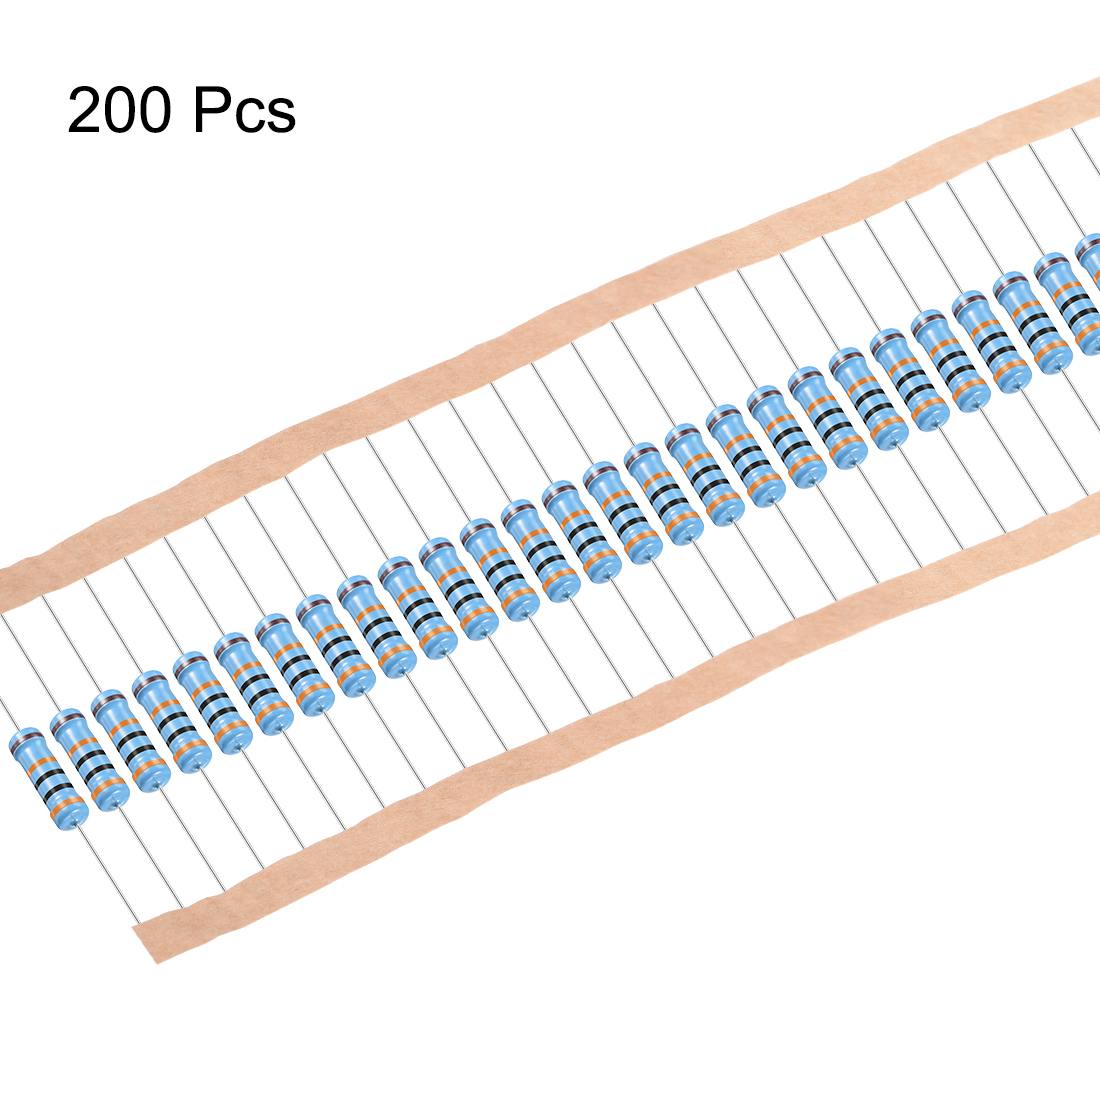 Metal Film Resistors 300k Ohm 1W 1% Tolerances 5 Color Bands Pack of 200 - image 2 of 4